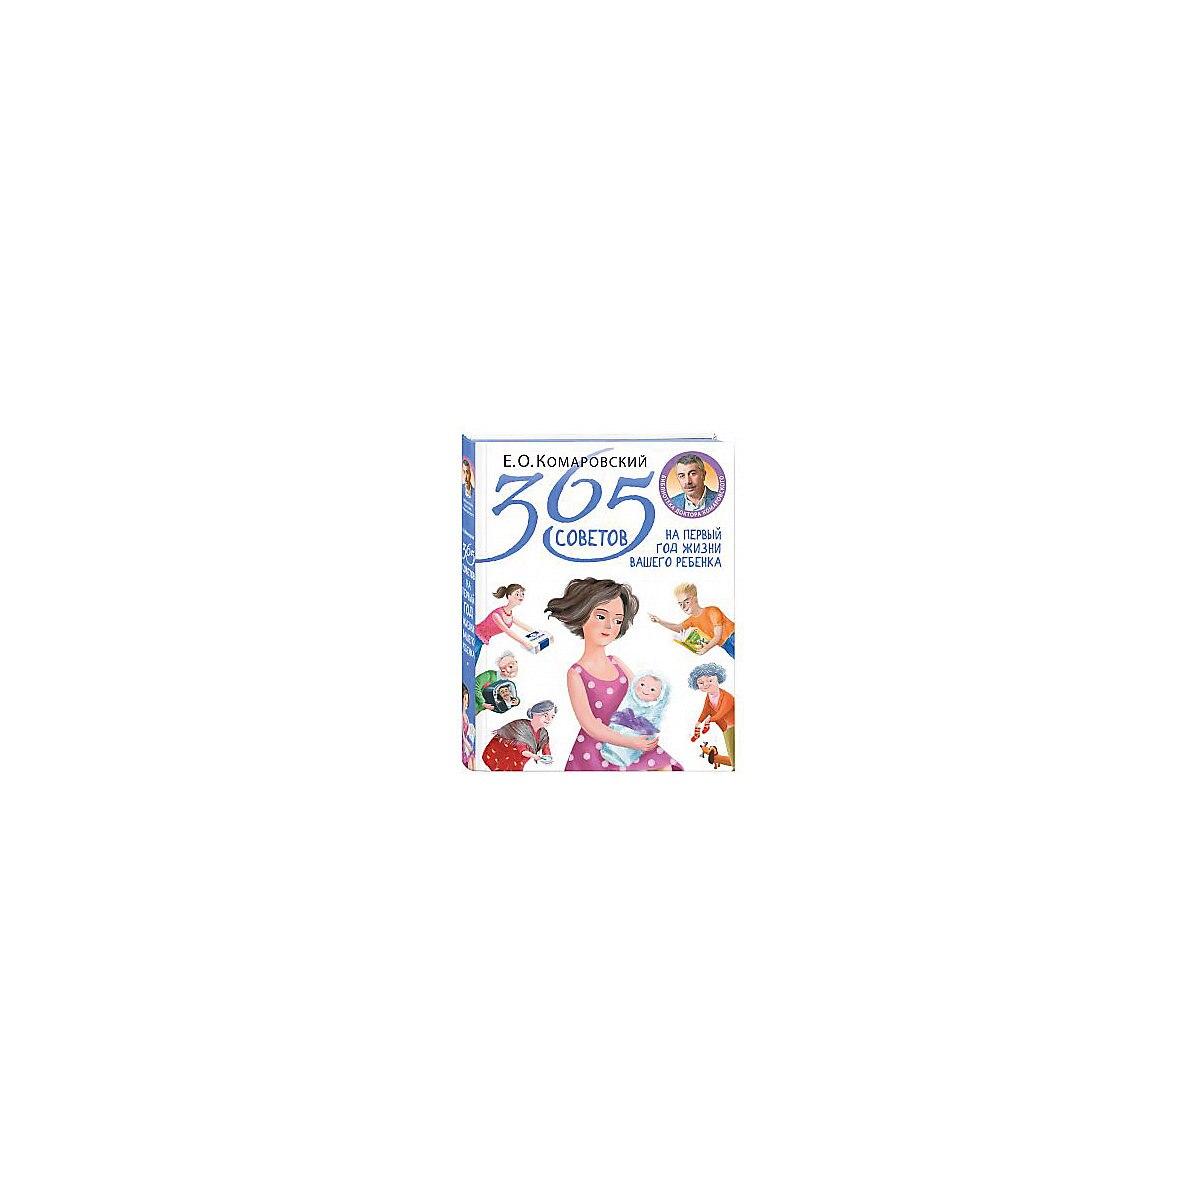 Books EKSMO 8495243 Children Education Encyclopedia Alphabet Dictionary Book For Baby MTpromo